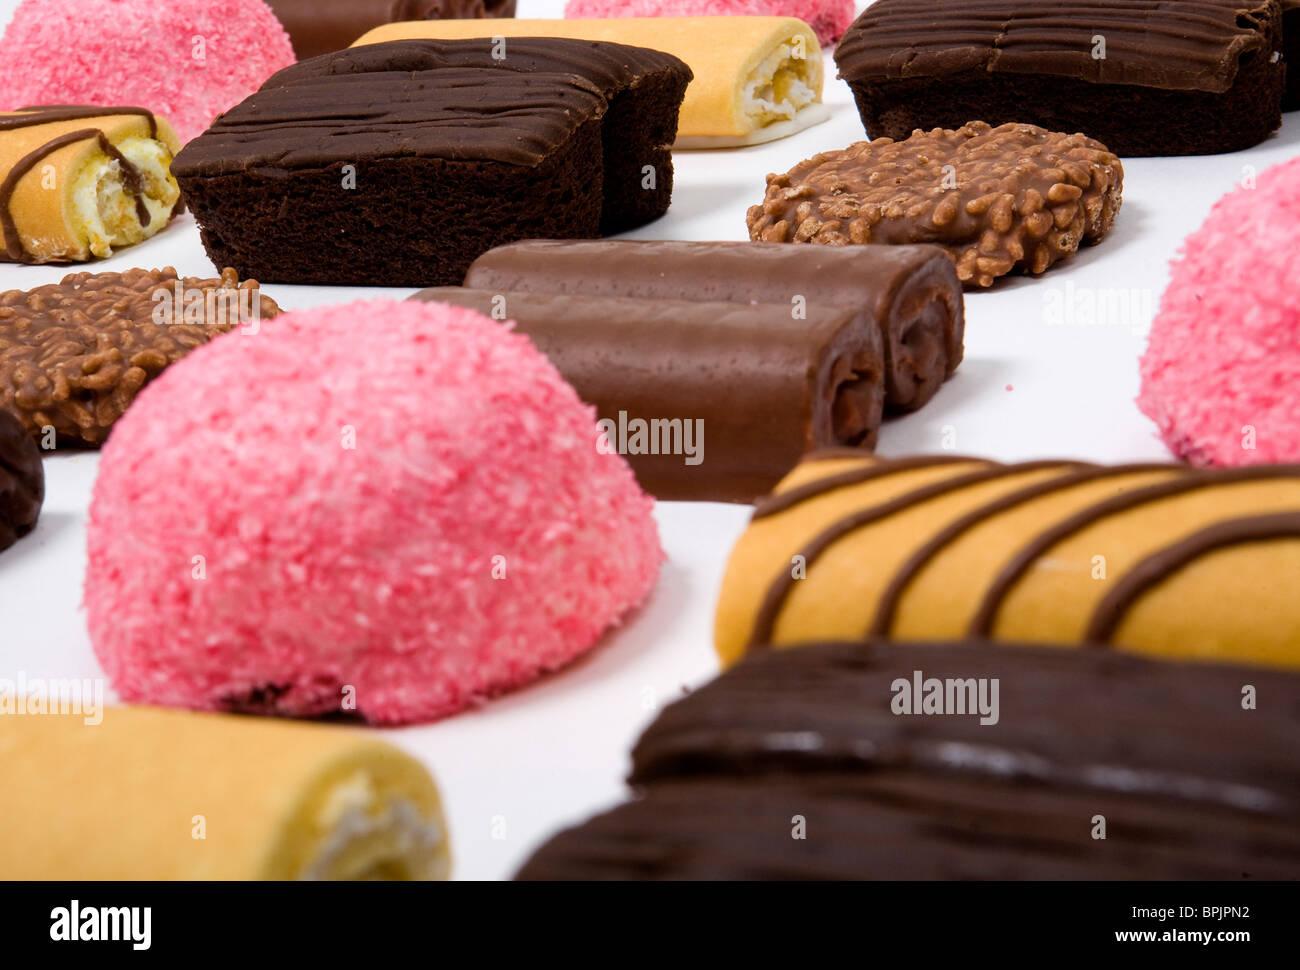 An assortment of junk food items.  - Stock Image